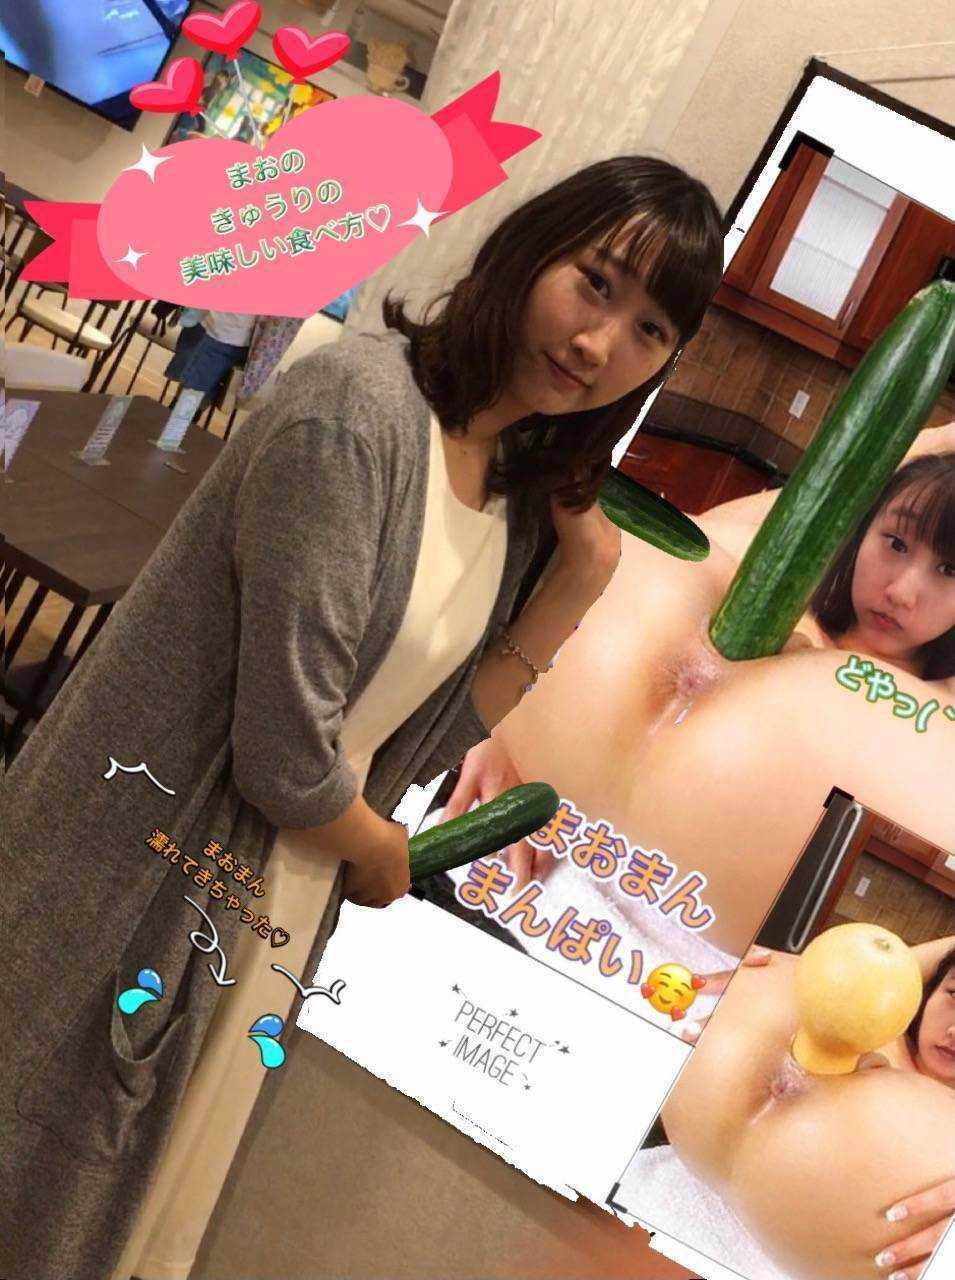 sayamarika peta2.jp 過去の少女hebe naked sayamarika peta2.jp過去の少女hebe naked